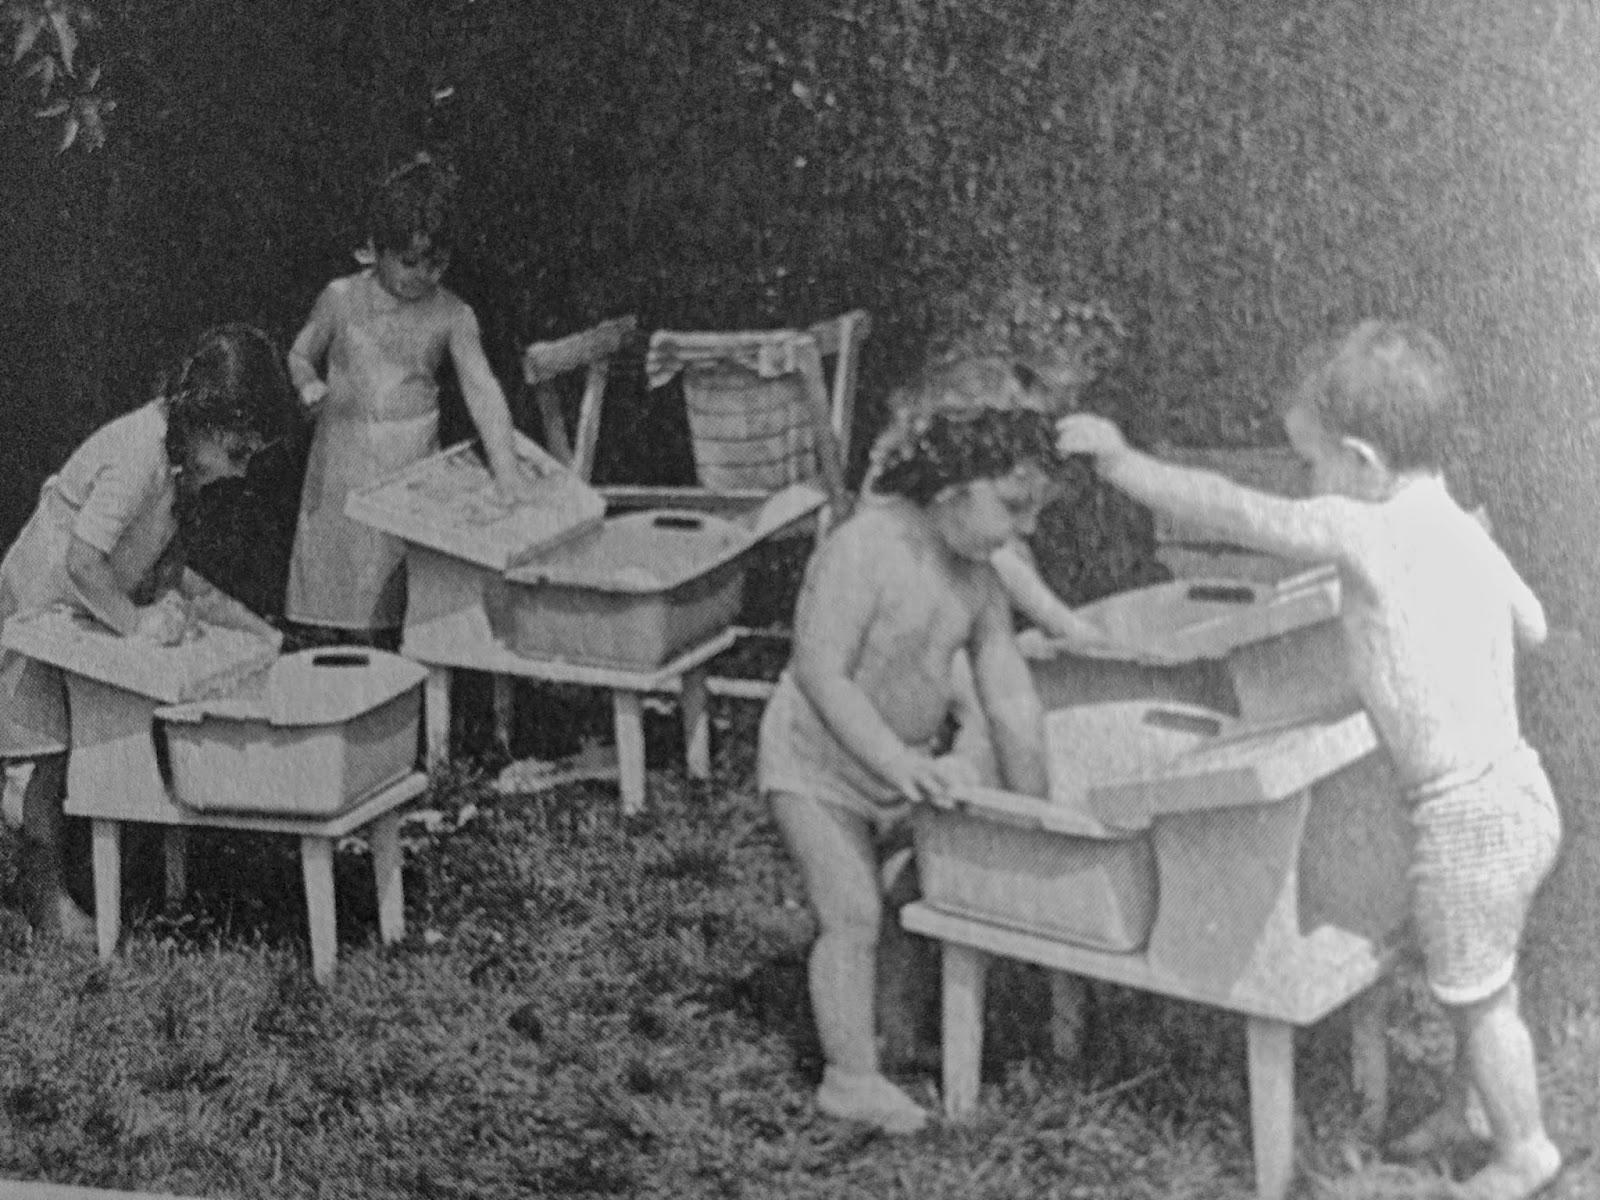 Lavare in giardino, Nido Caronno P. - Varese  - Foto 1